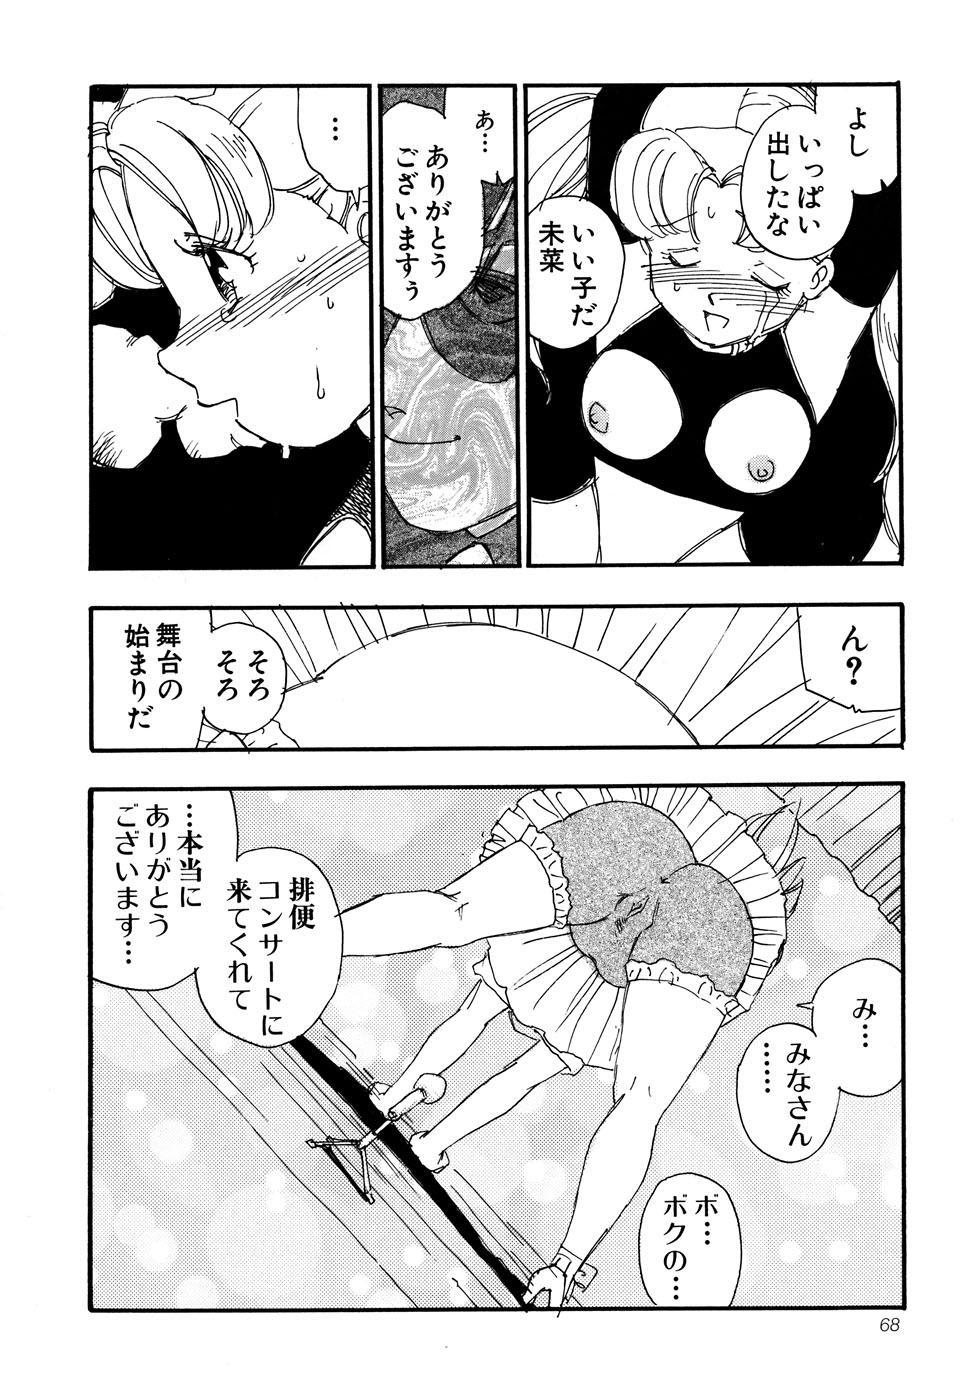 G-drive Vol.1 Ryoujokuhen 67